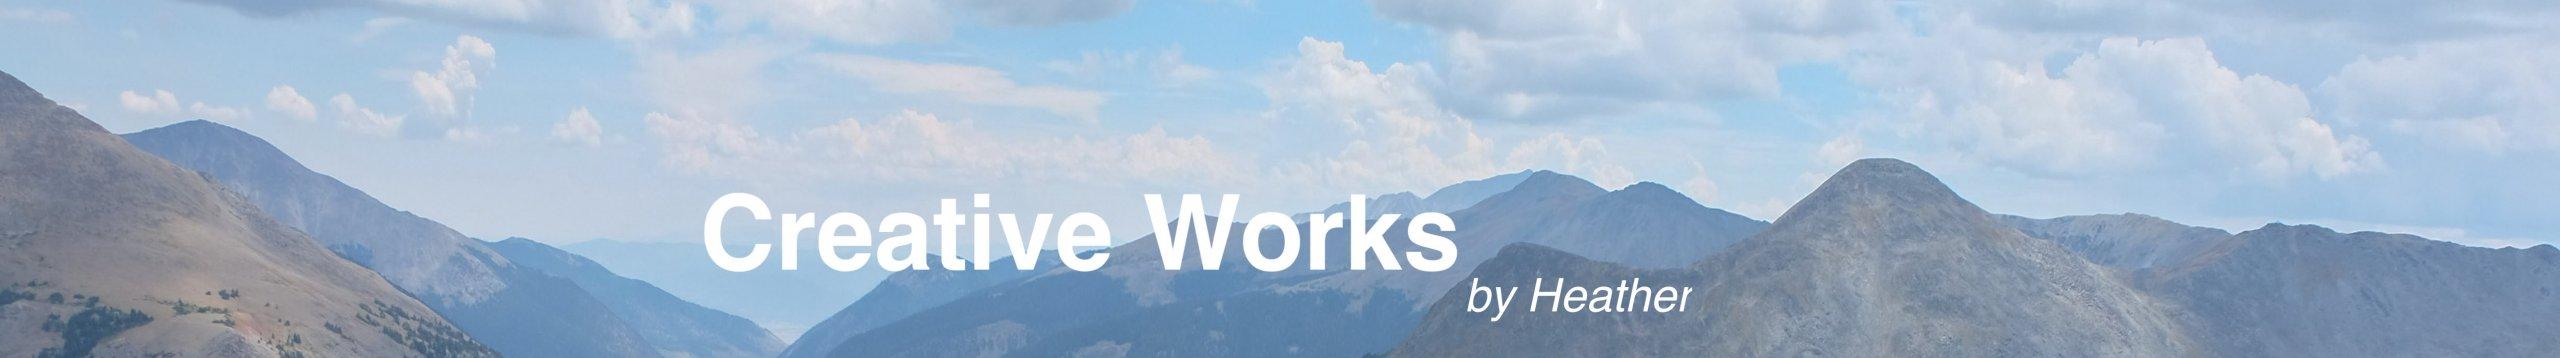 creative works for digital programs